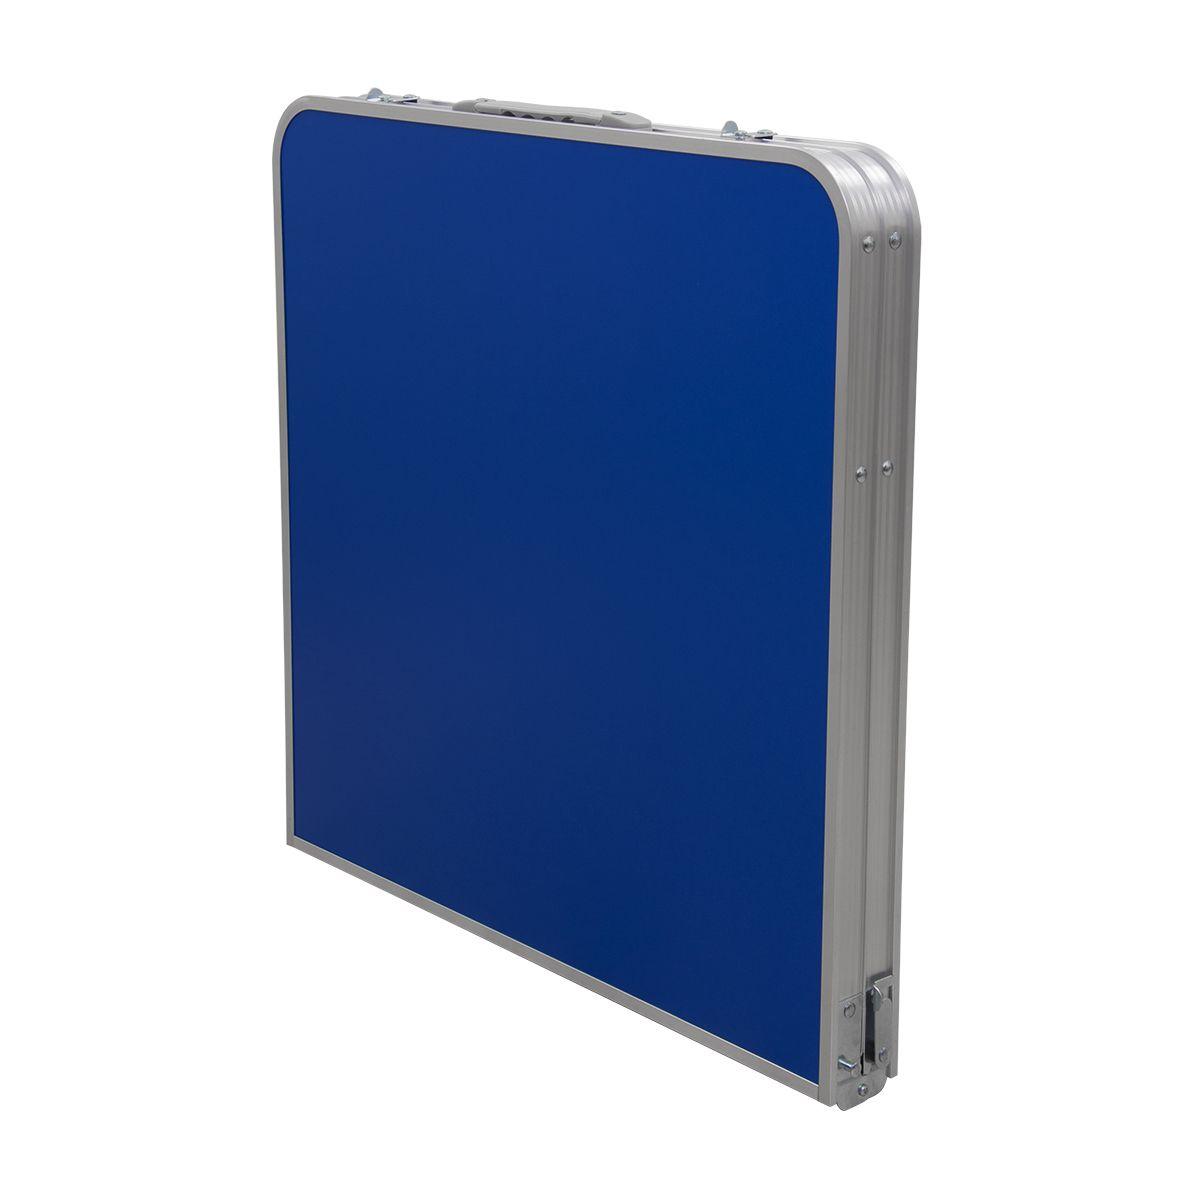 Mesa Dobrável Pelegrin PEL-0210 em Metal Azul Vira Maleta